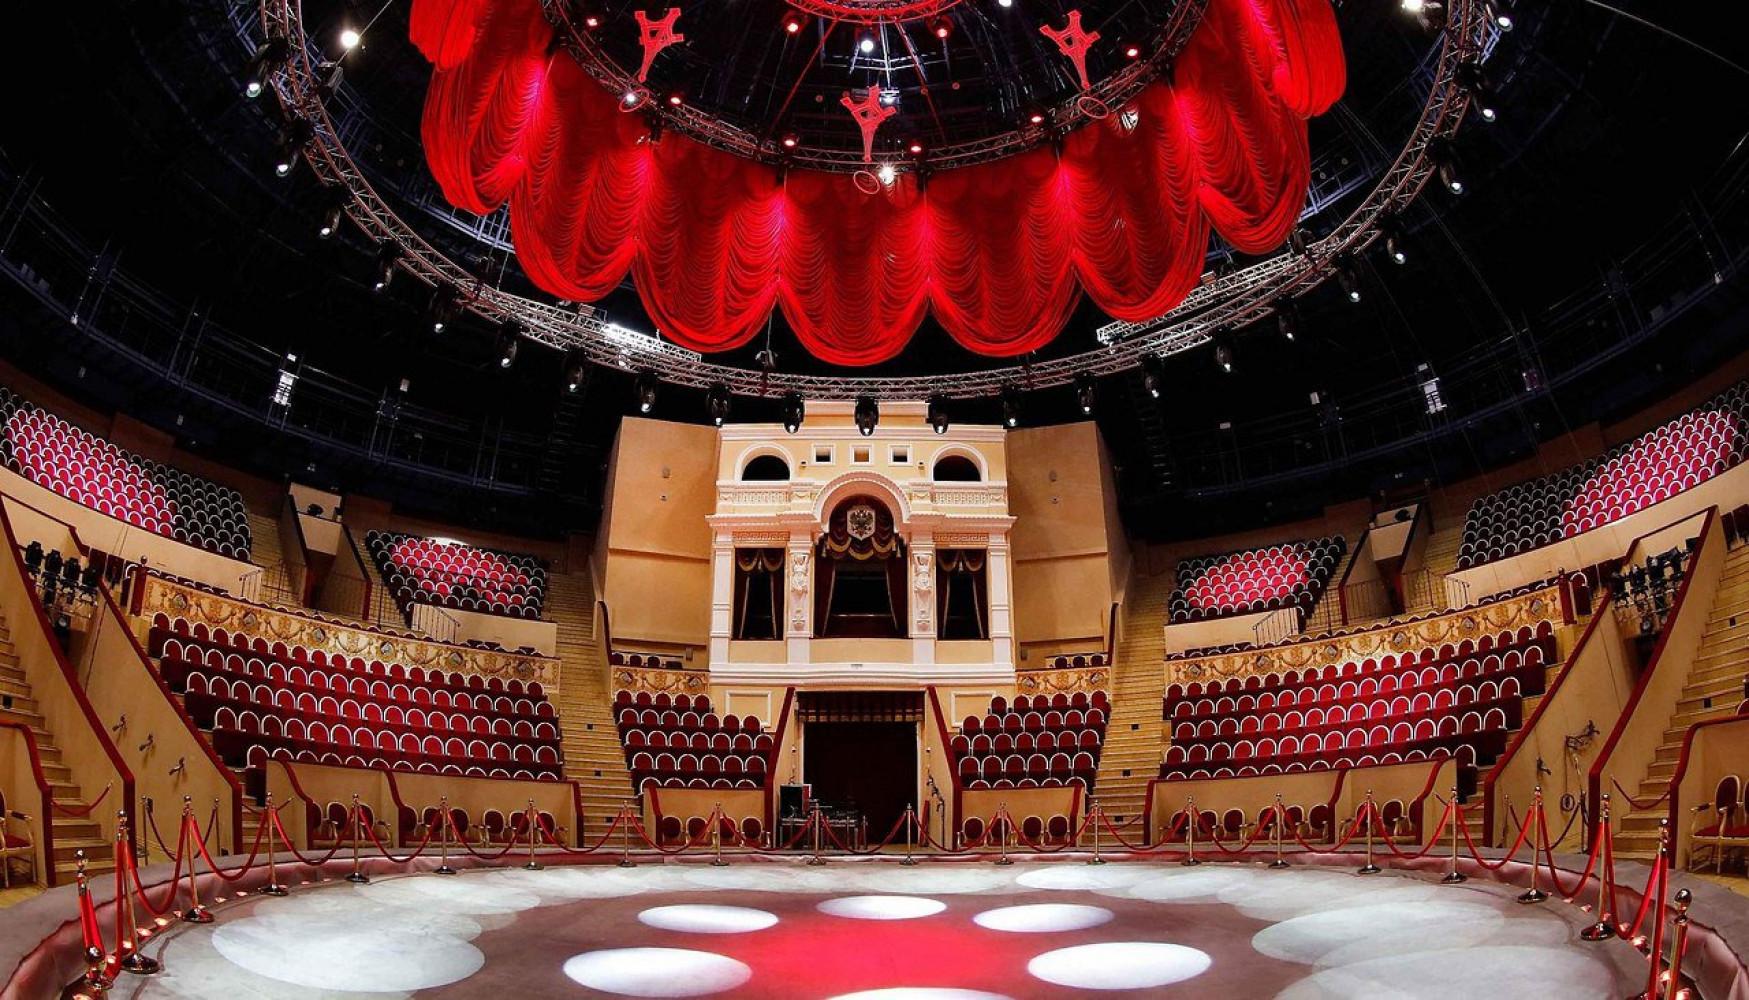 фото нового зала цирка на фонтанке данном